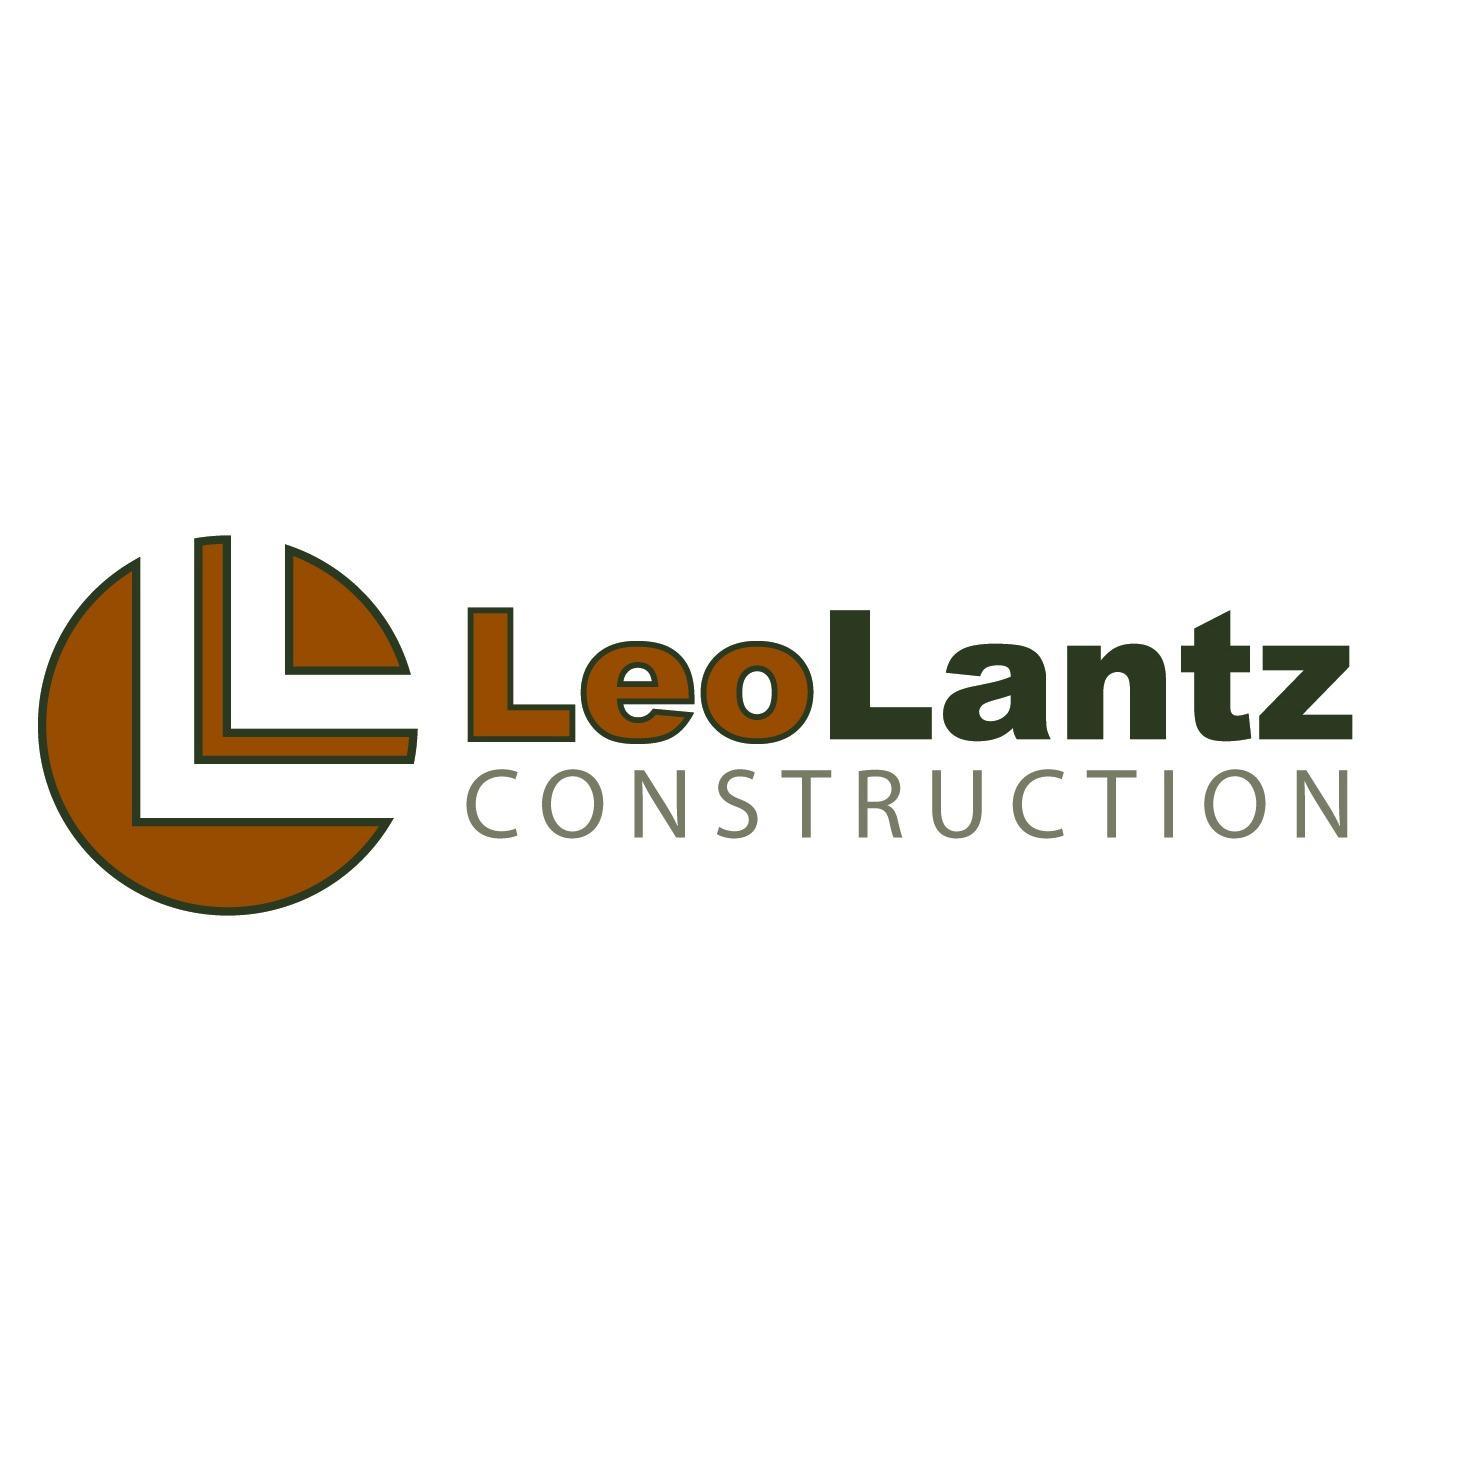 Leo Lantz Construction, Inc. image 11